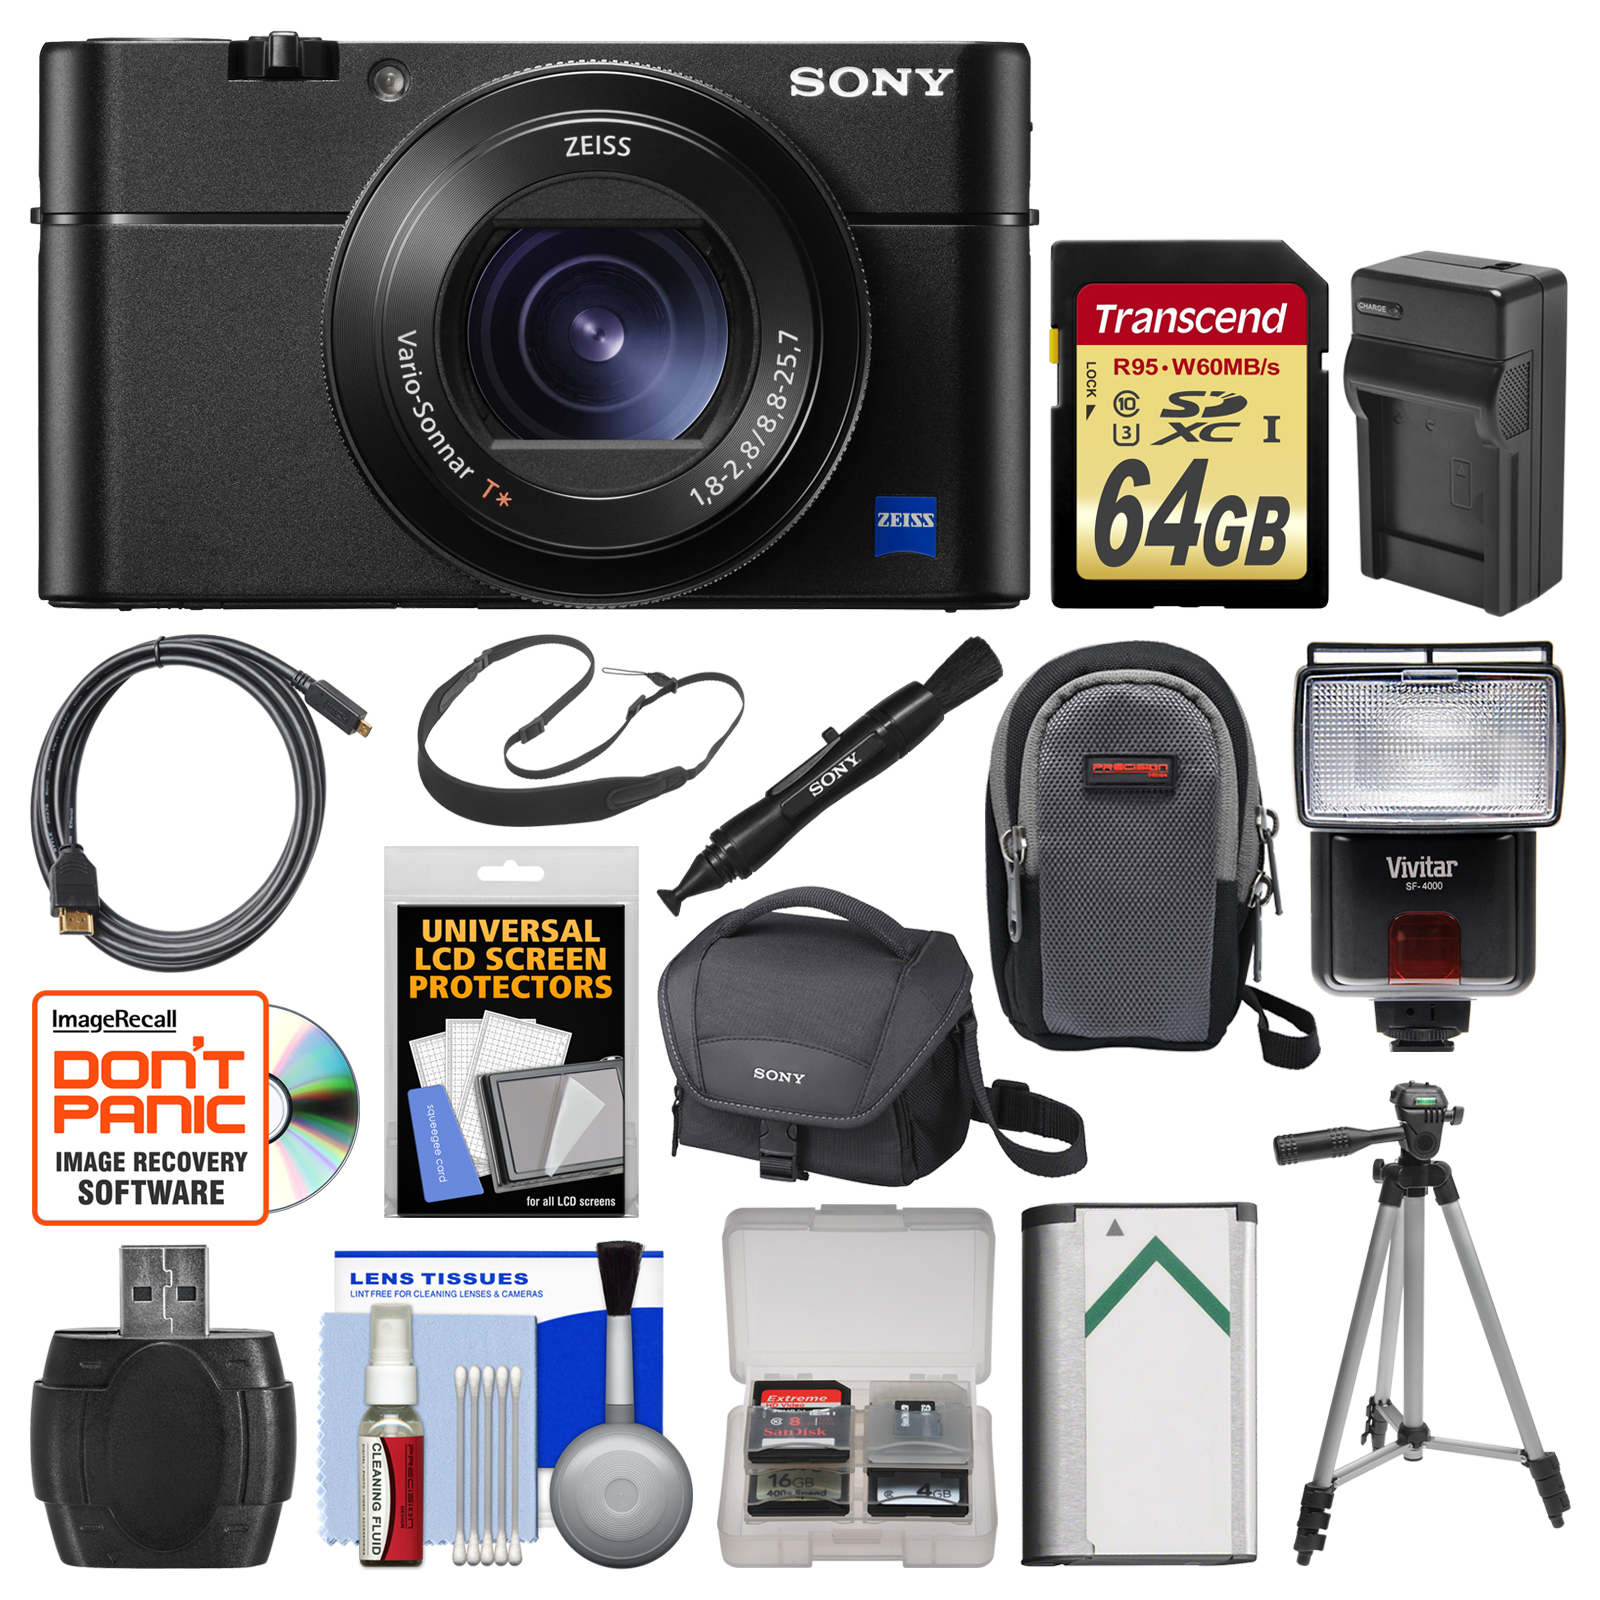 Sony Cyber-Shot DSC-RX100 V 4K Wi-Fi Digital Camera with 64GB Card + Case + Flash + Battery & Charger + Tripod... by Sony